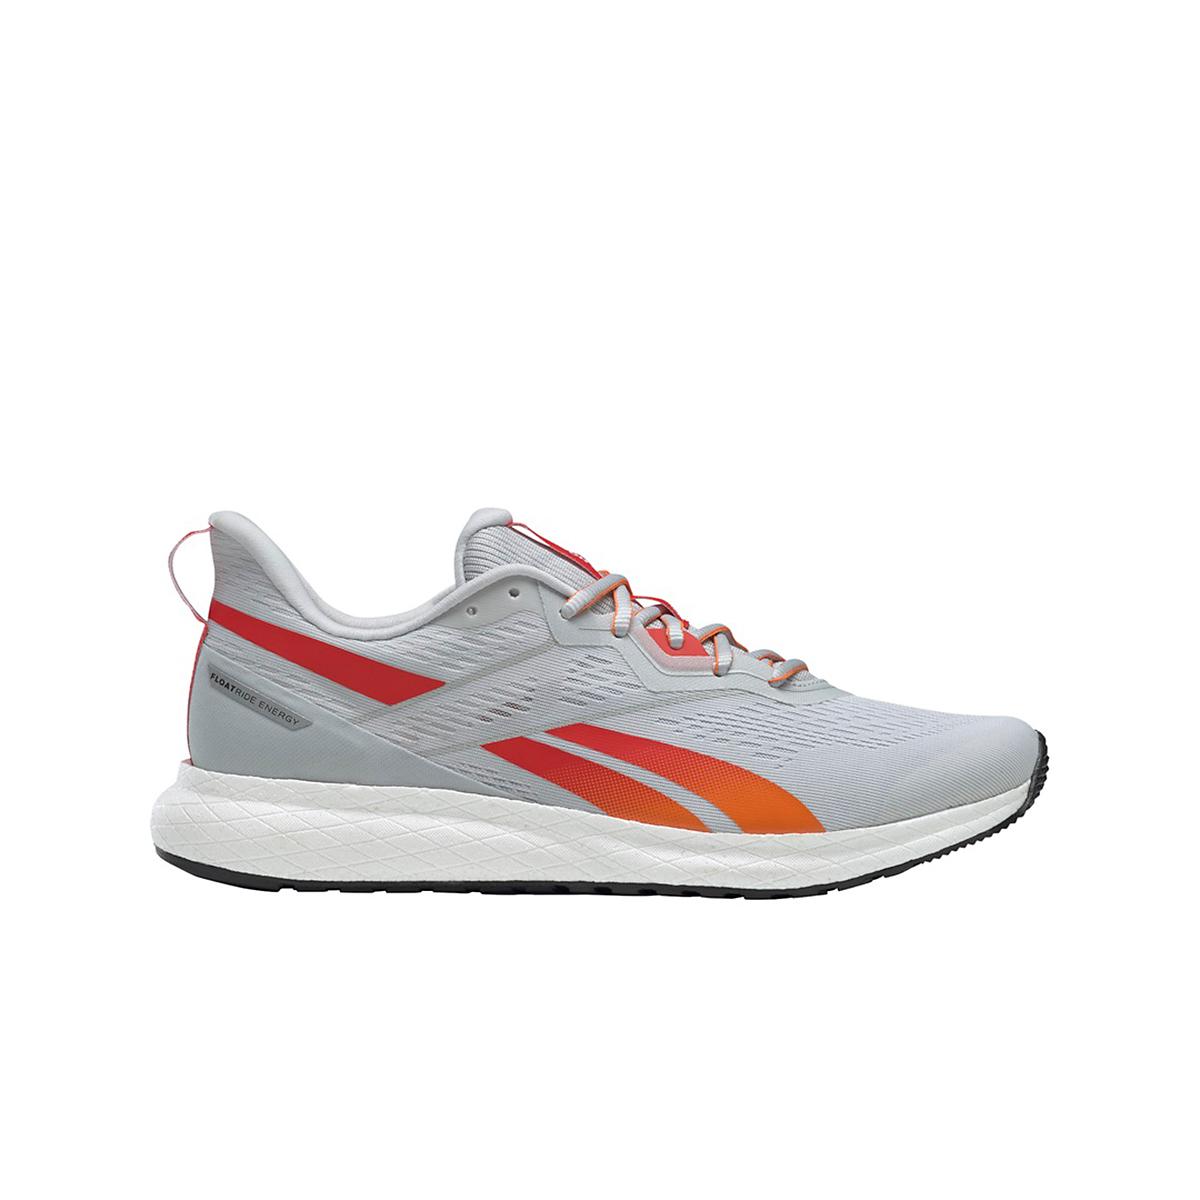 Men's Reebok Forever Floatride Energy 2.0 Running Shoe - Color: Pure Grey/White/High Vis Orange - Size: 7 - Width: Regular, Pure Grey/White/High Vis Orange, large, image 1